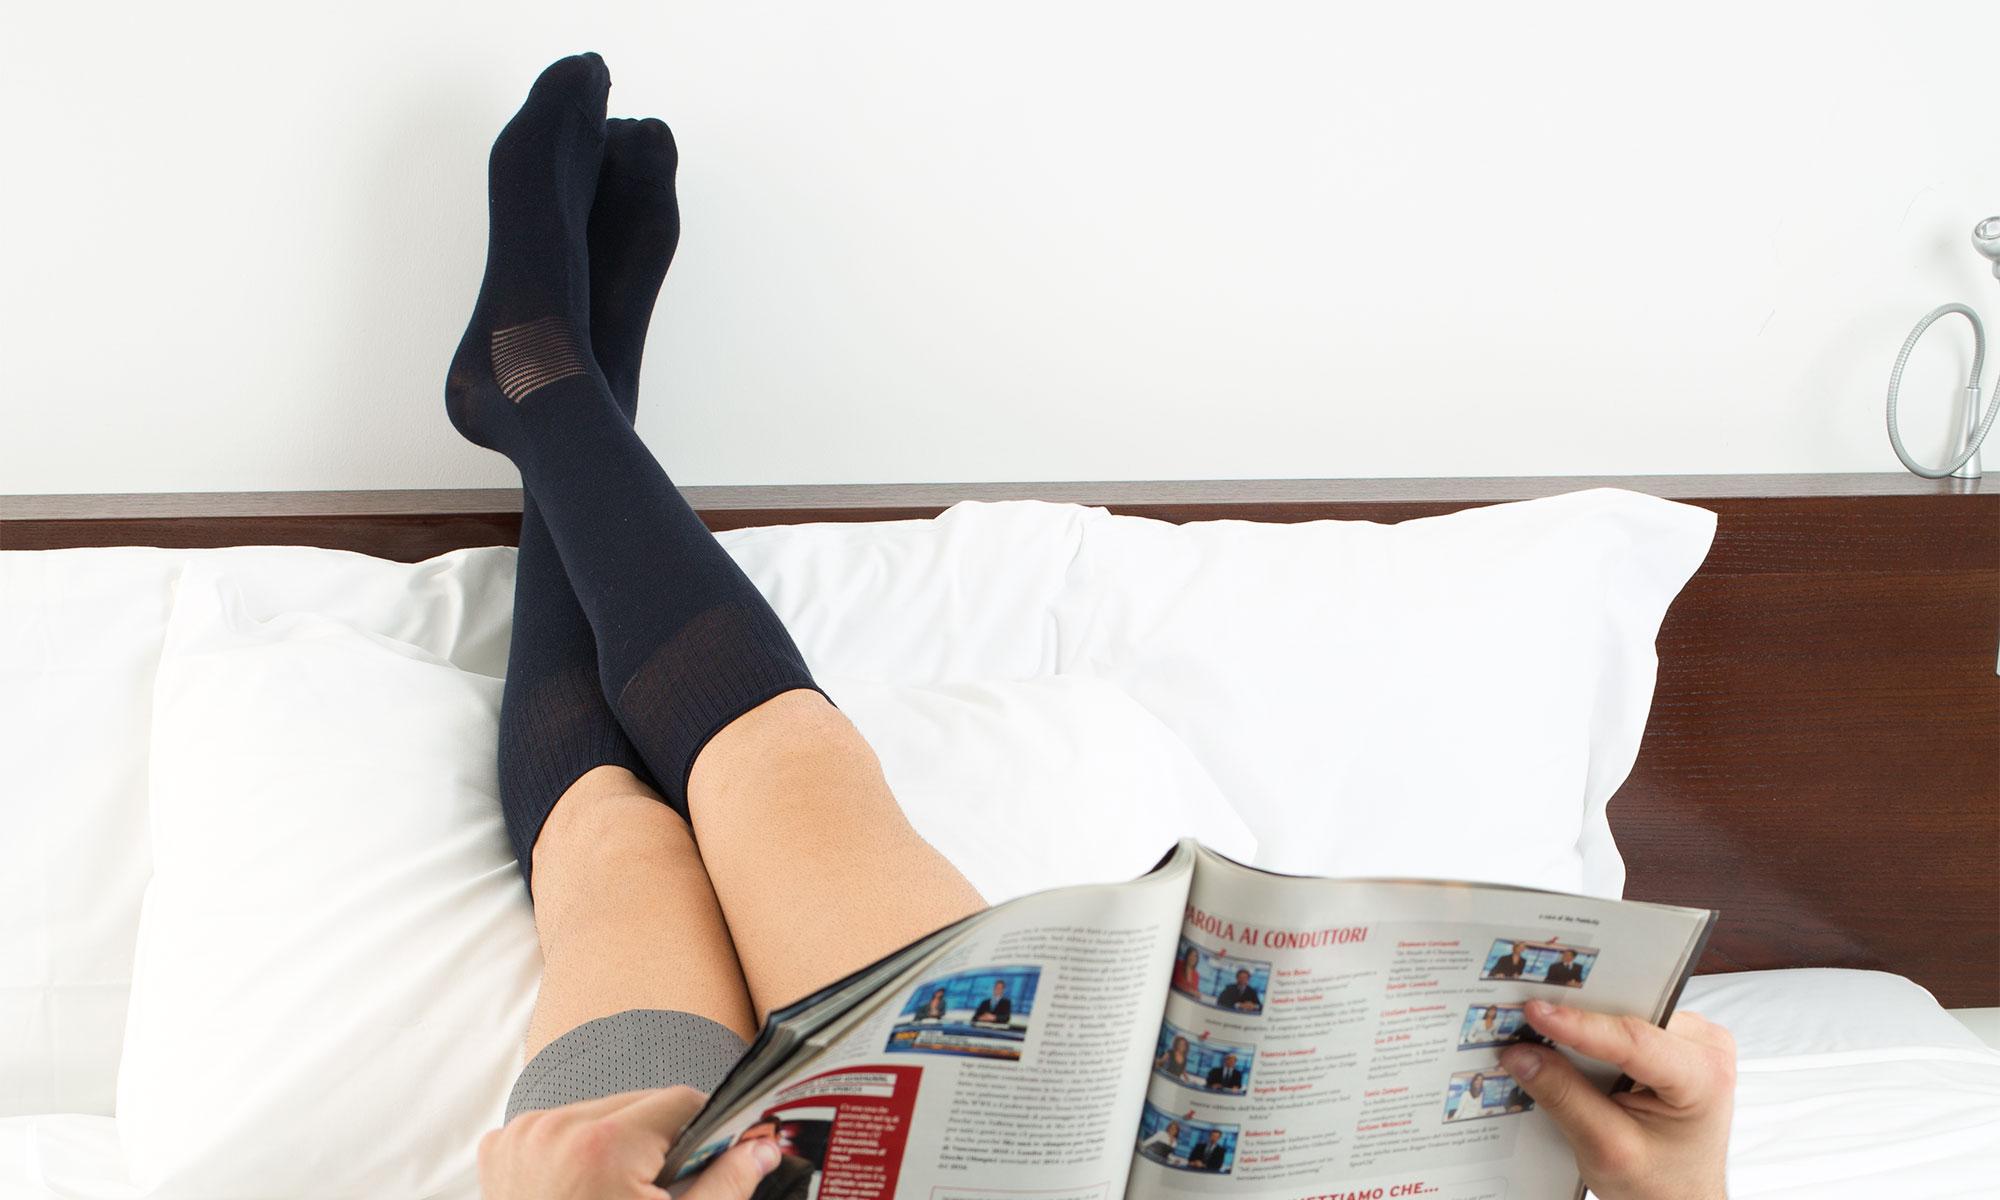 relaxsan-diabetic-socks-560l